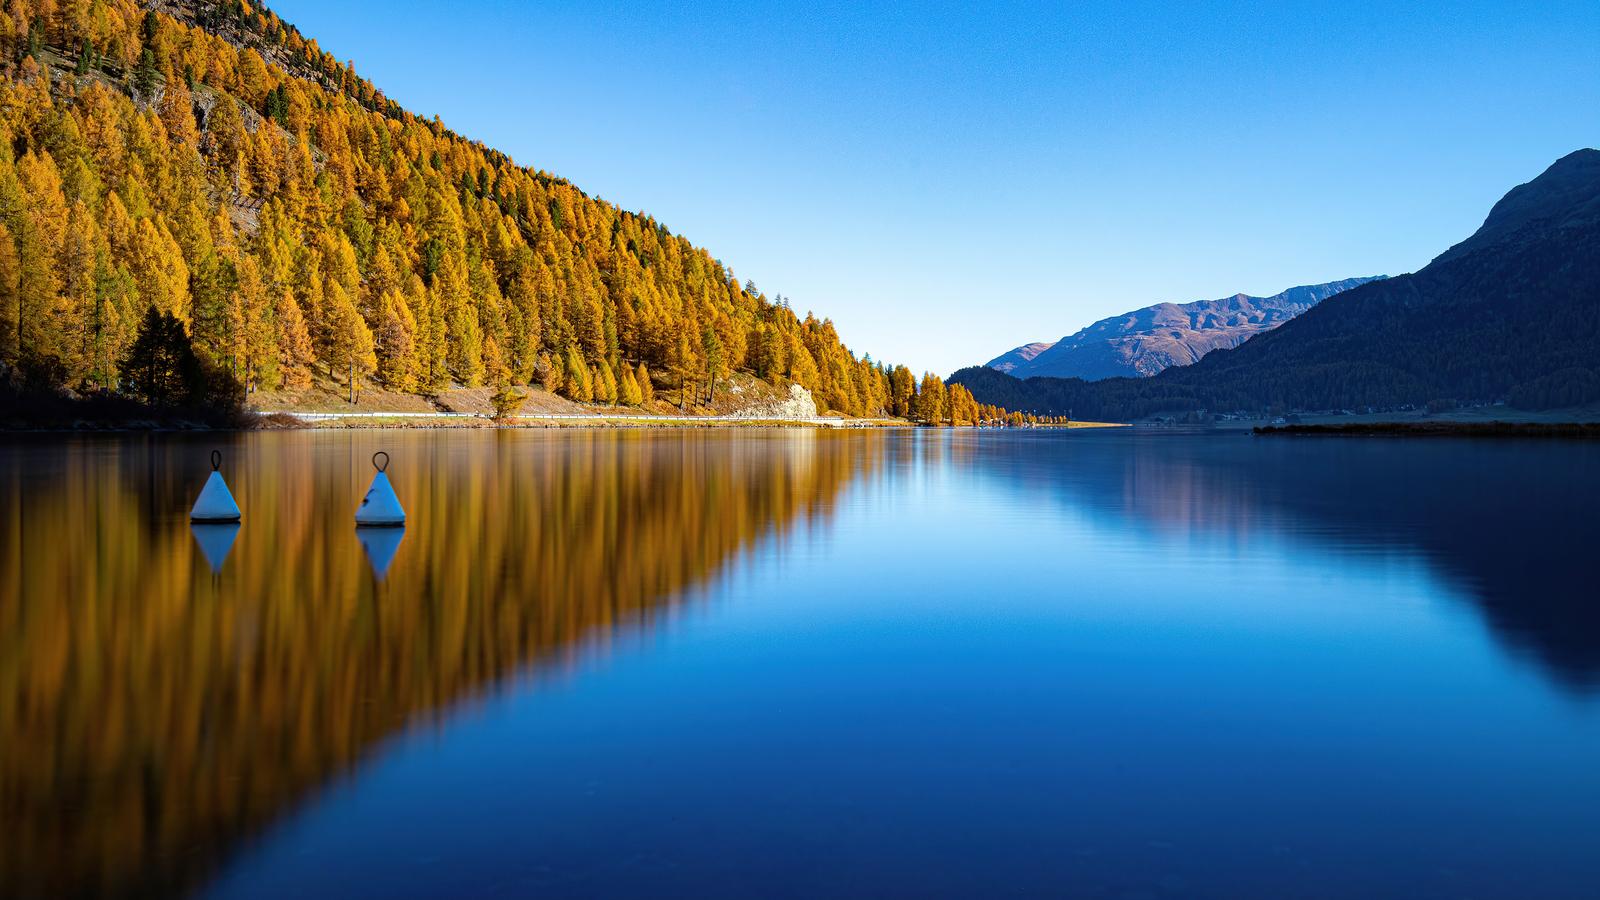 lake-silent-reflection-mountains-5k-w9.jpg